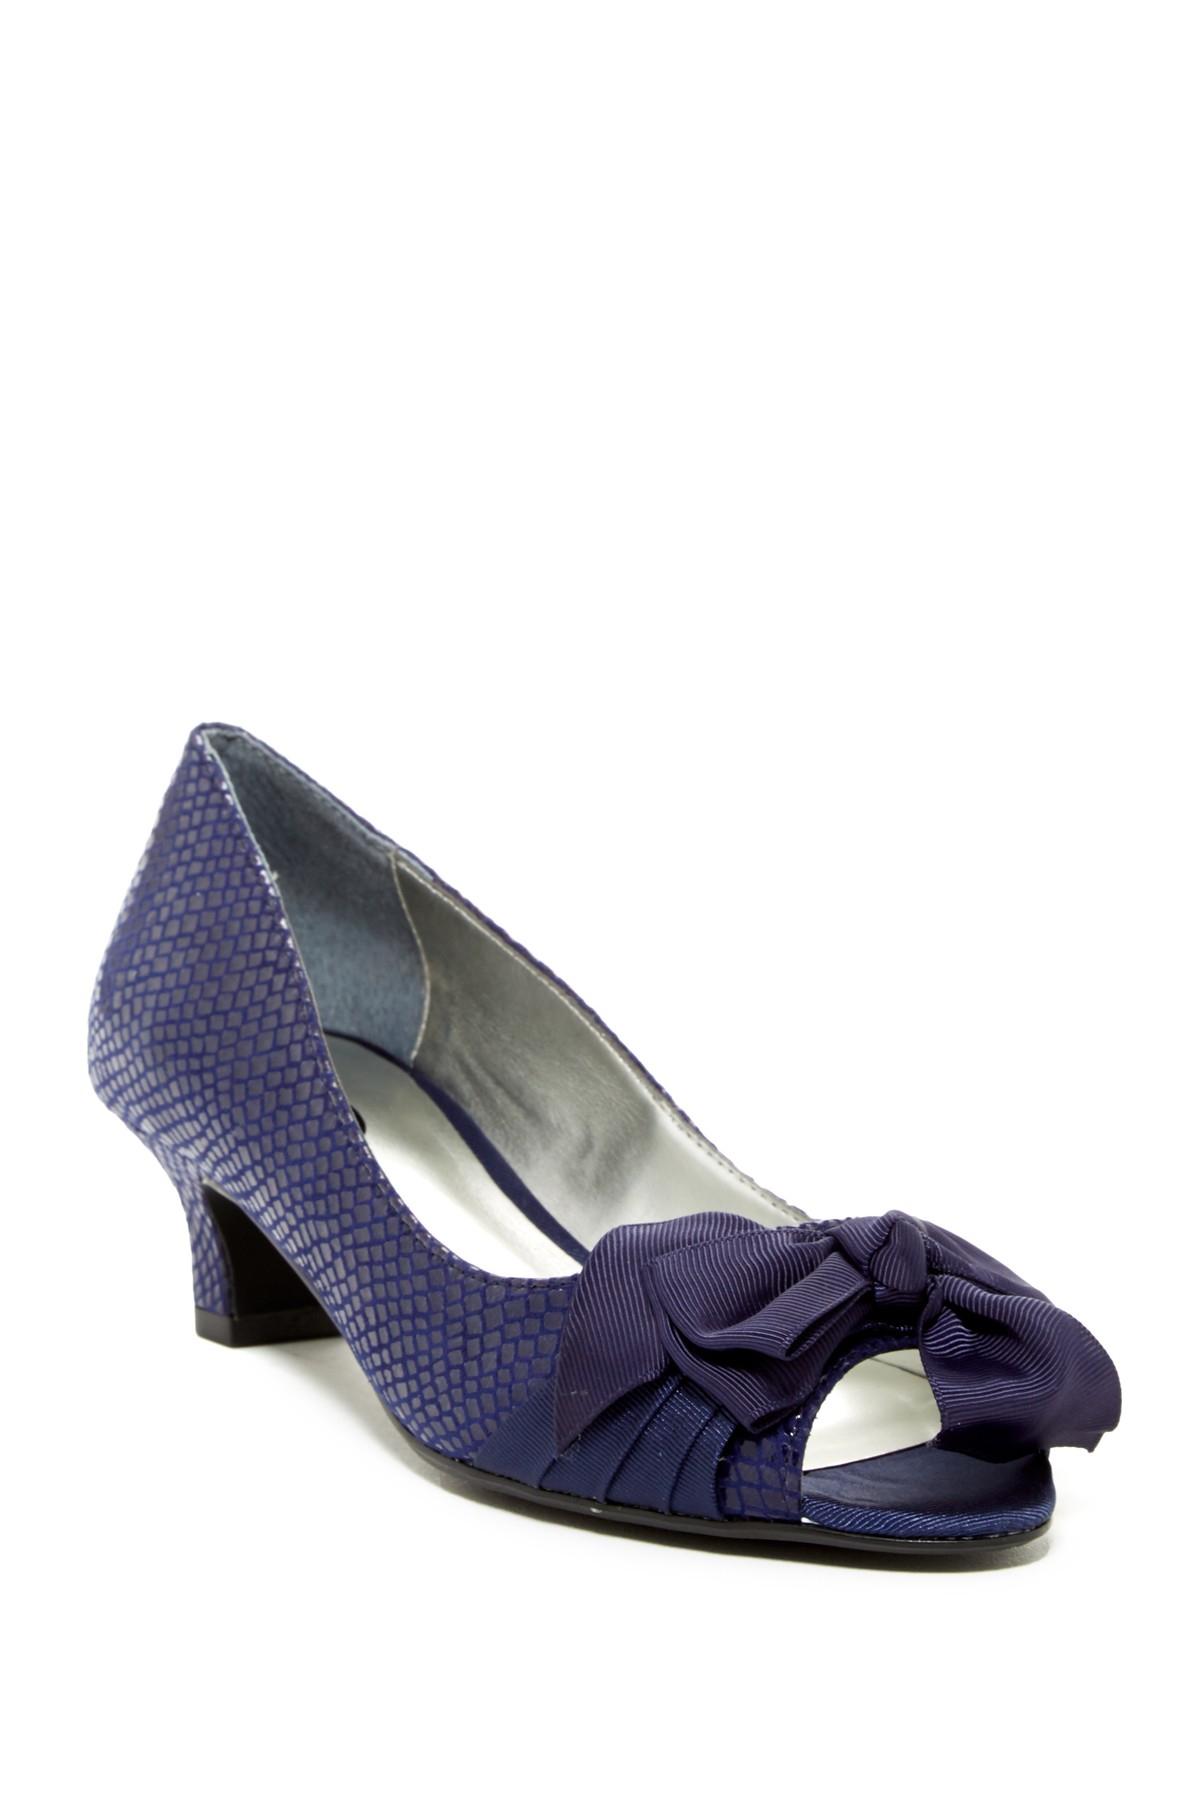 Nbardstrom Rack Womens Shoes